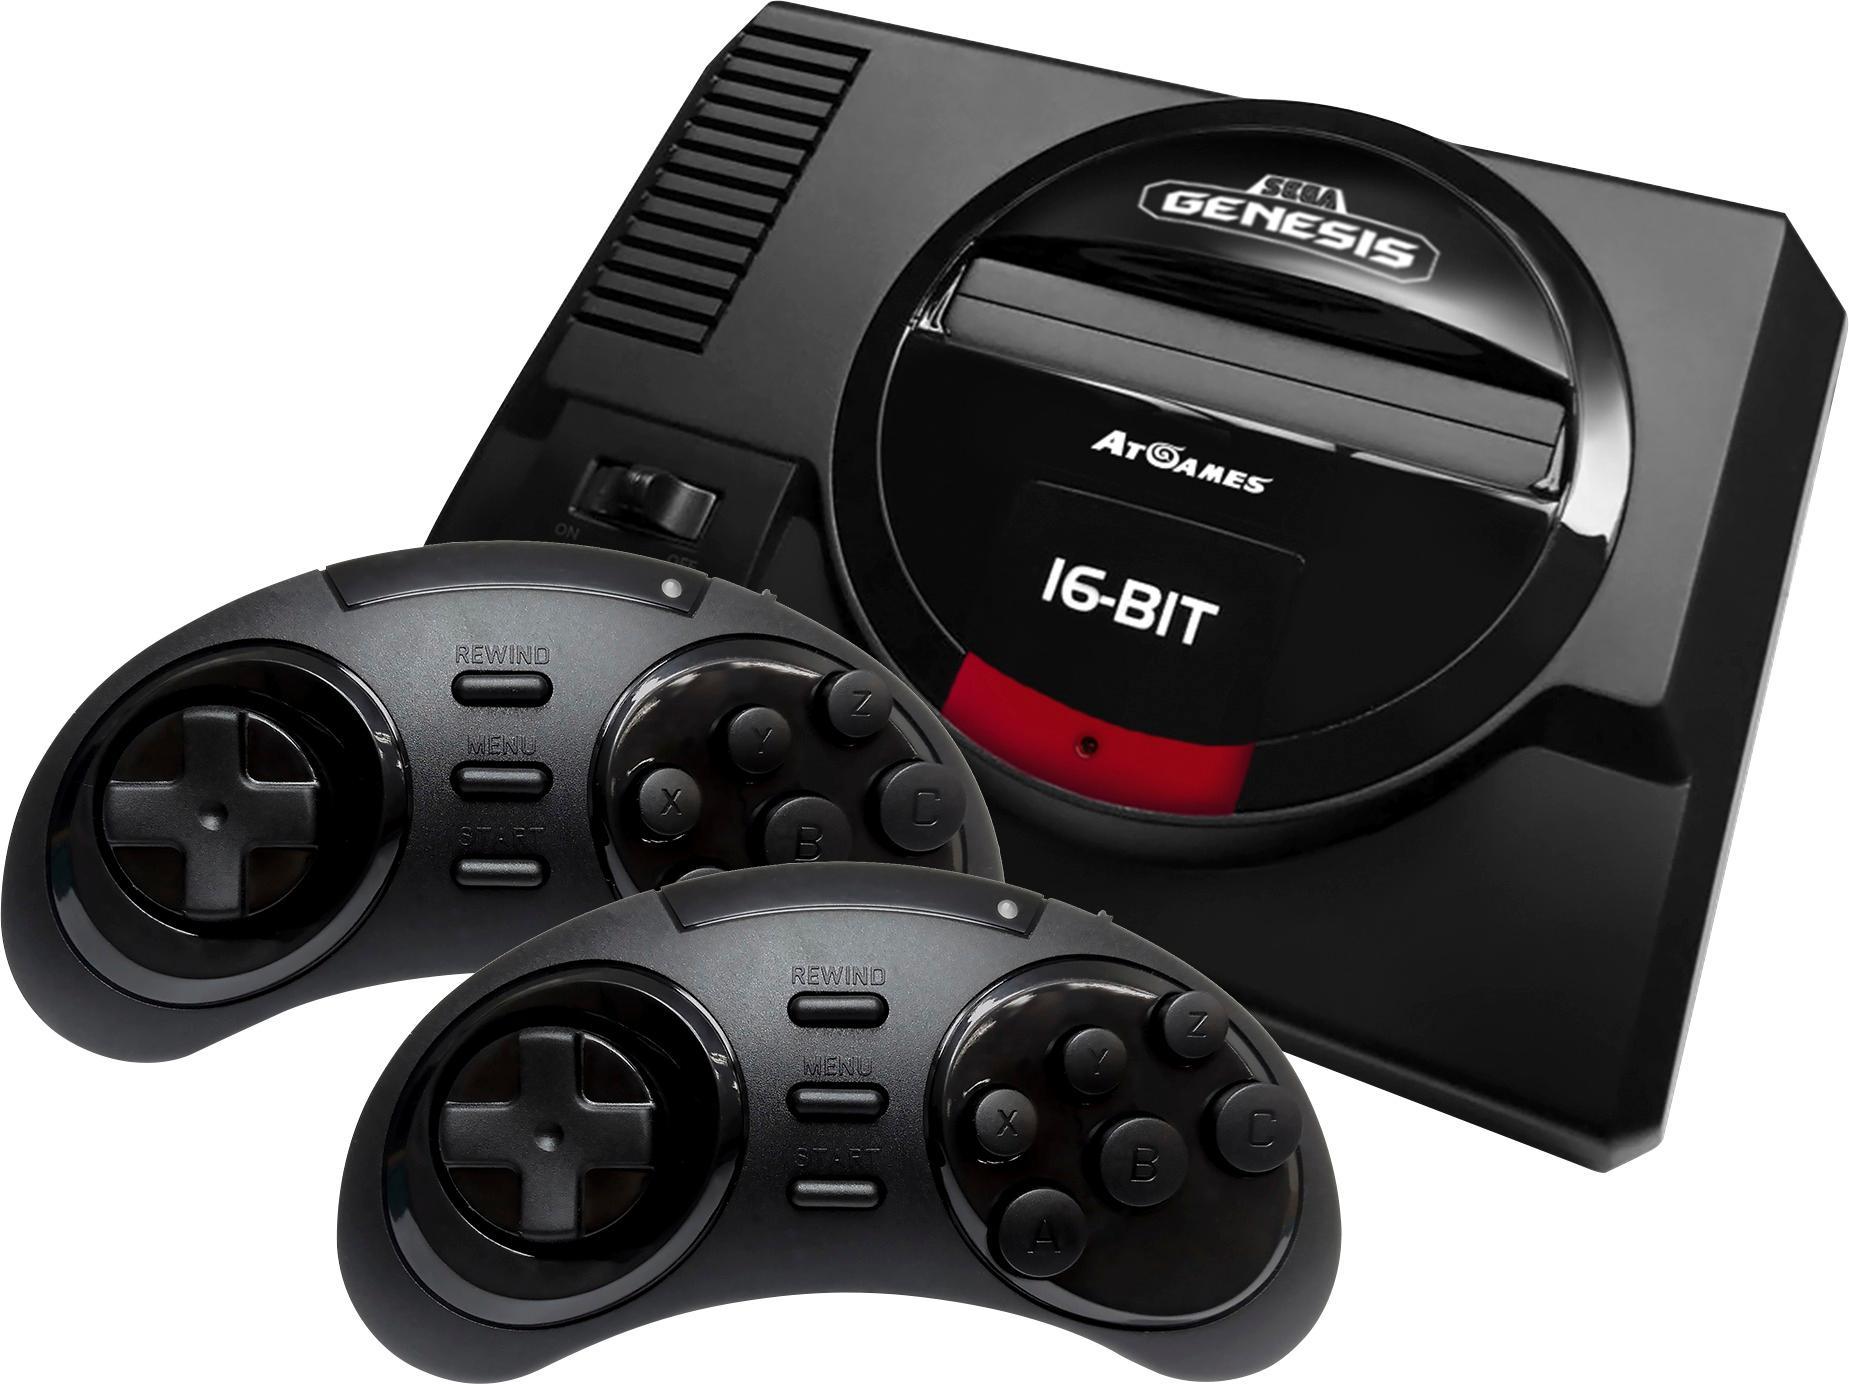 Sega - Genesis Flashback Console - Black